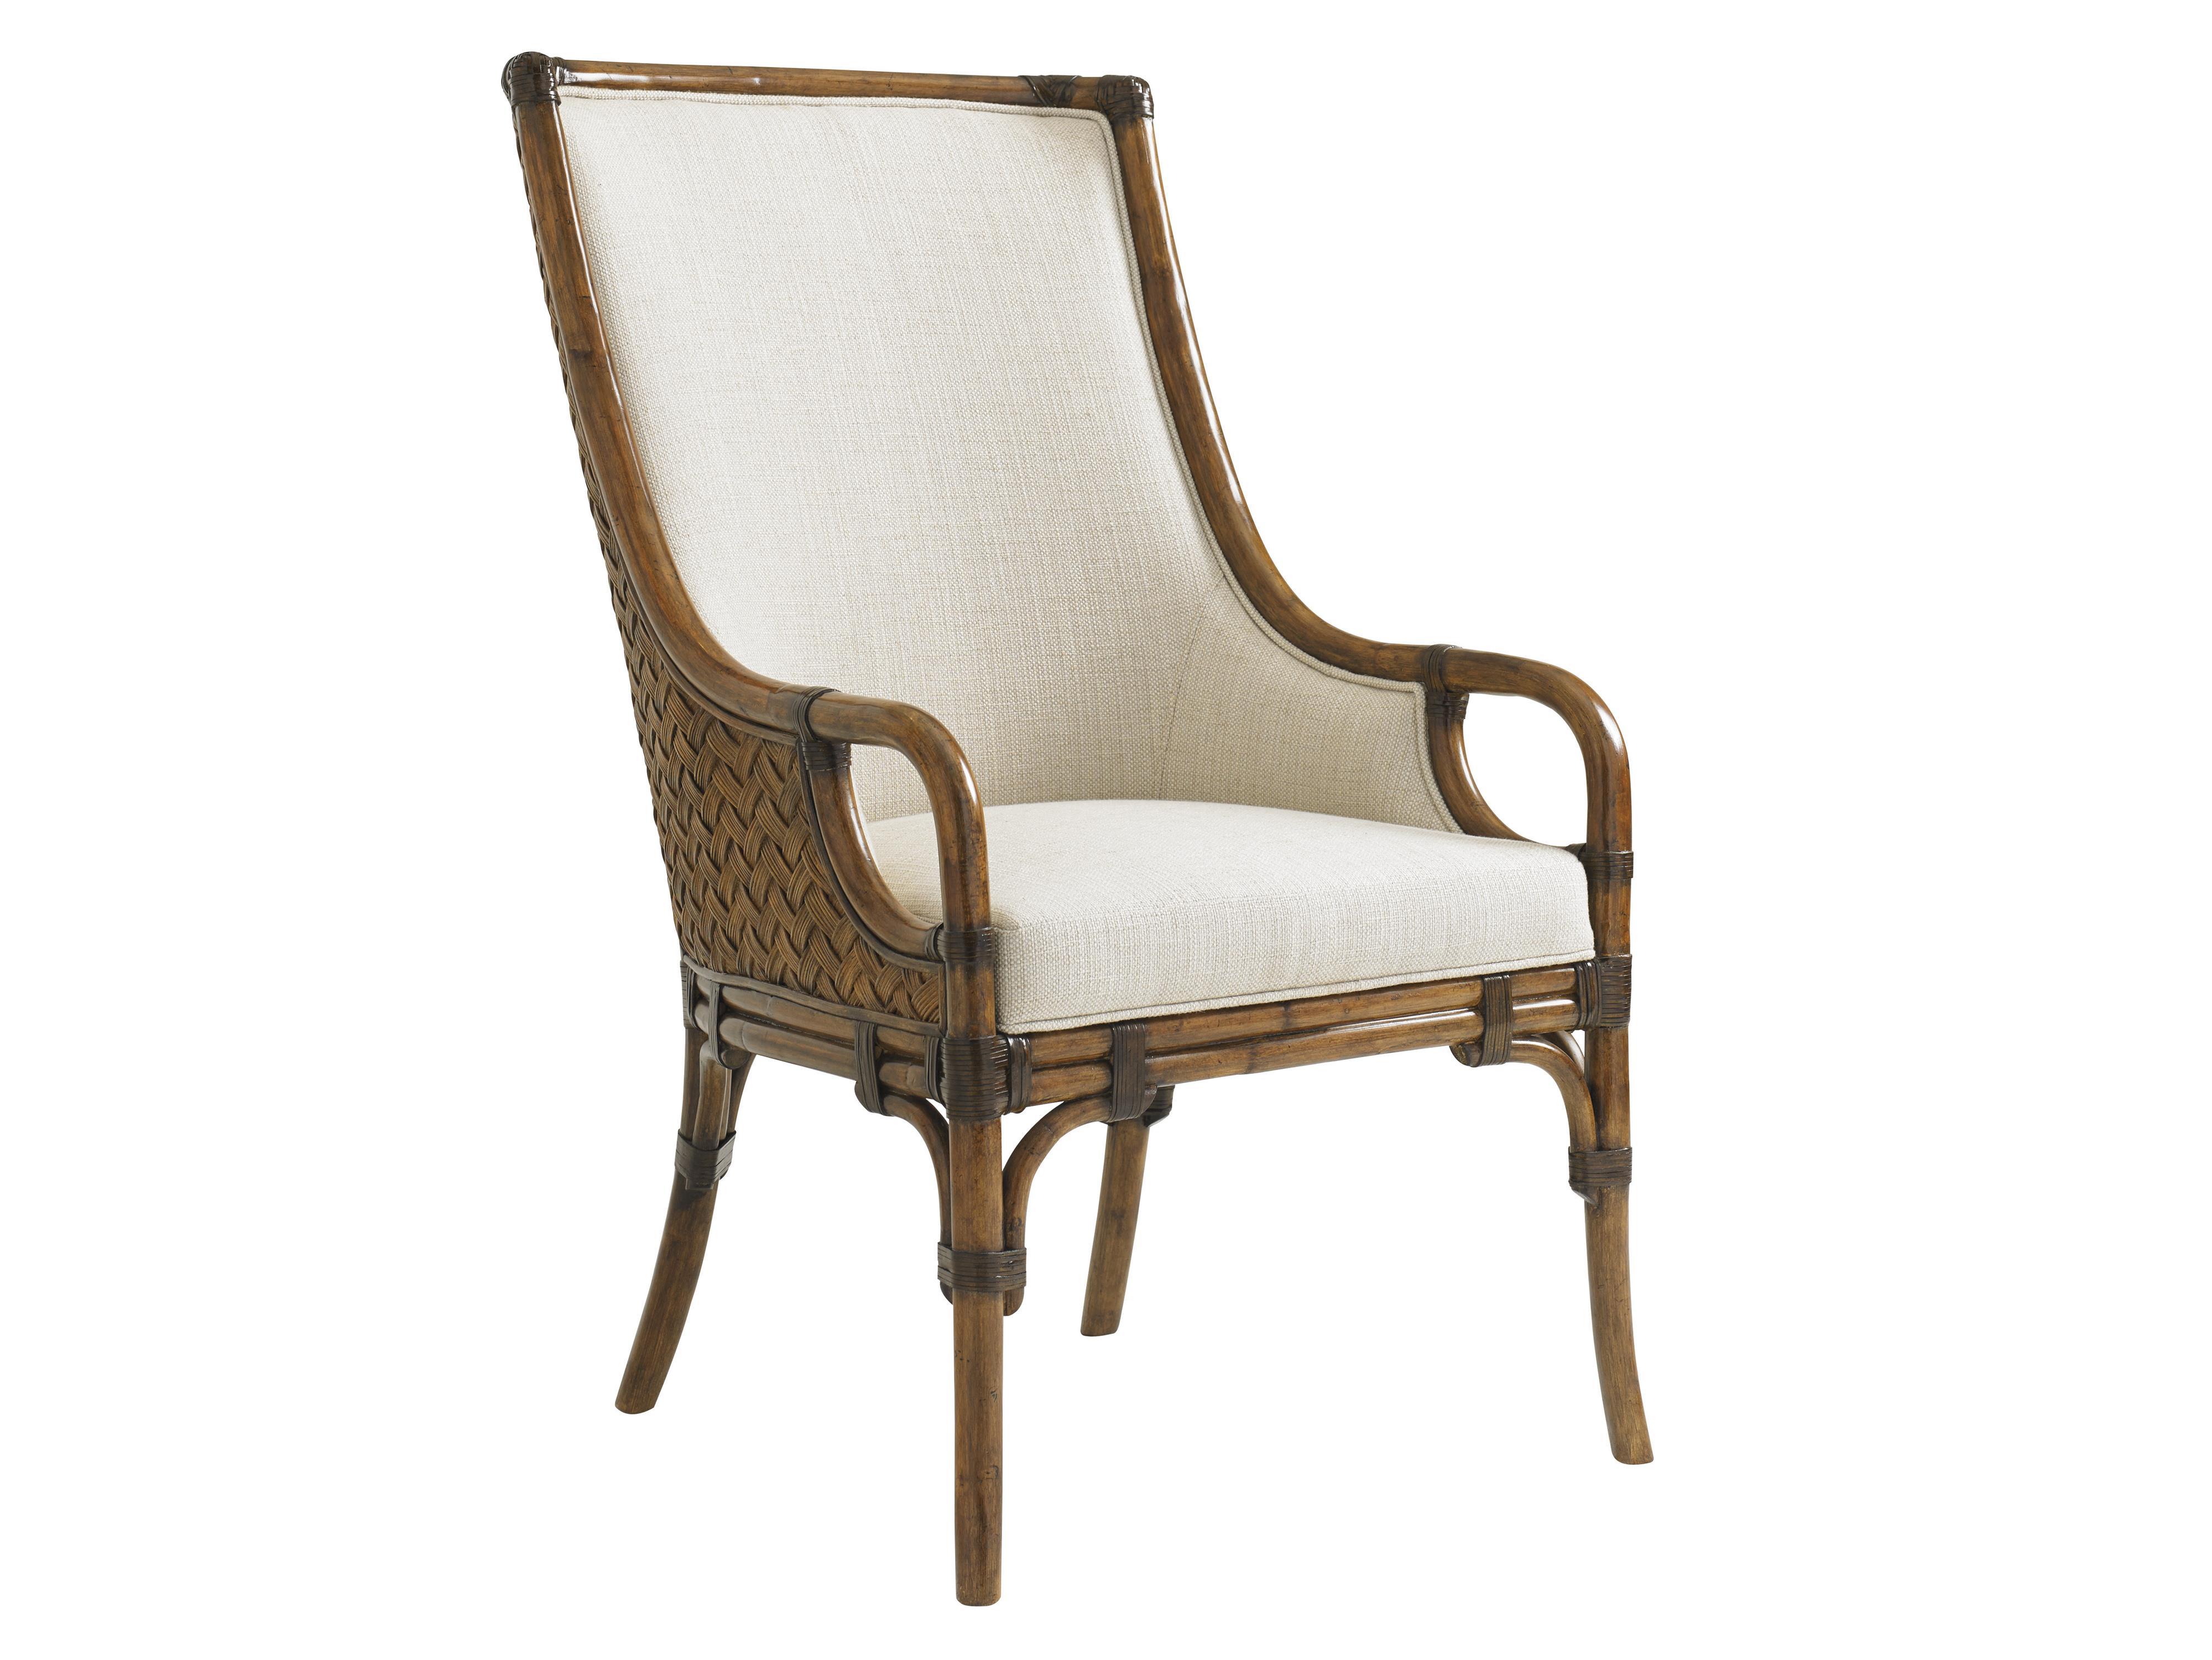 Bali Hai Custom Marabella Upholstered Arm Chair by Tommy Bahama Home at Baer's Furniture